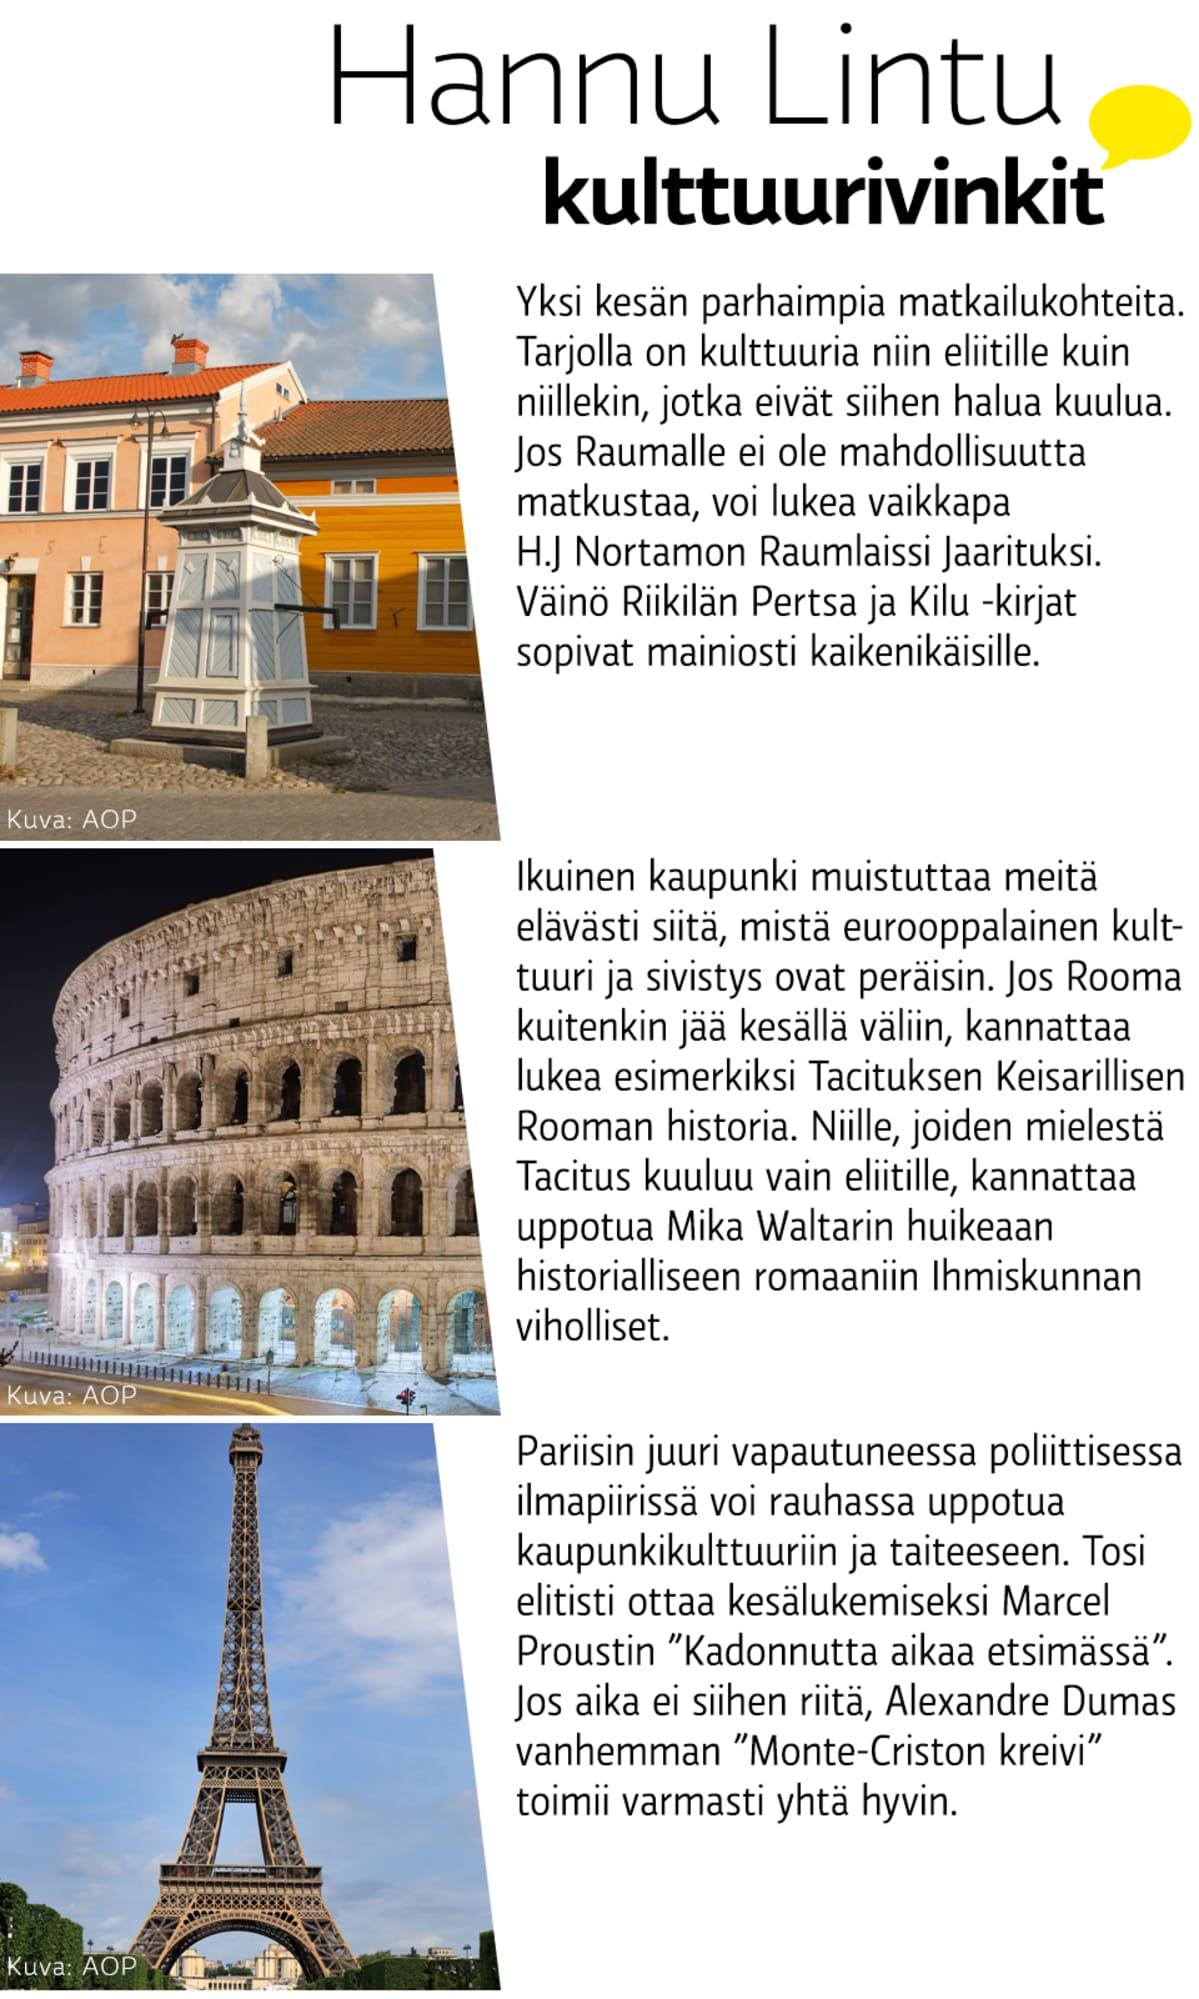 Hannu Linnun kulttuurivinkit